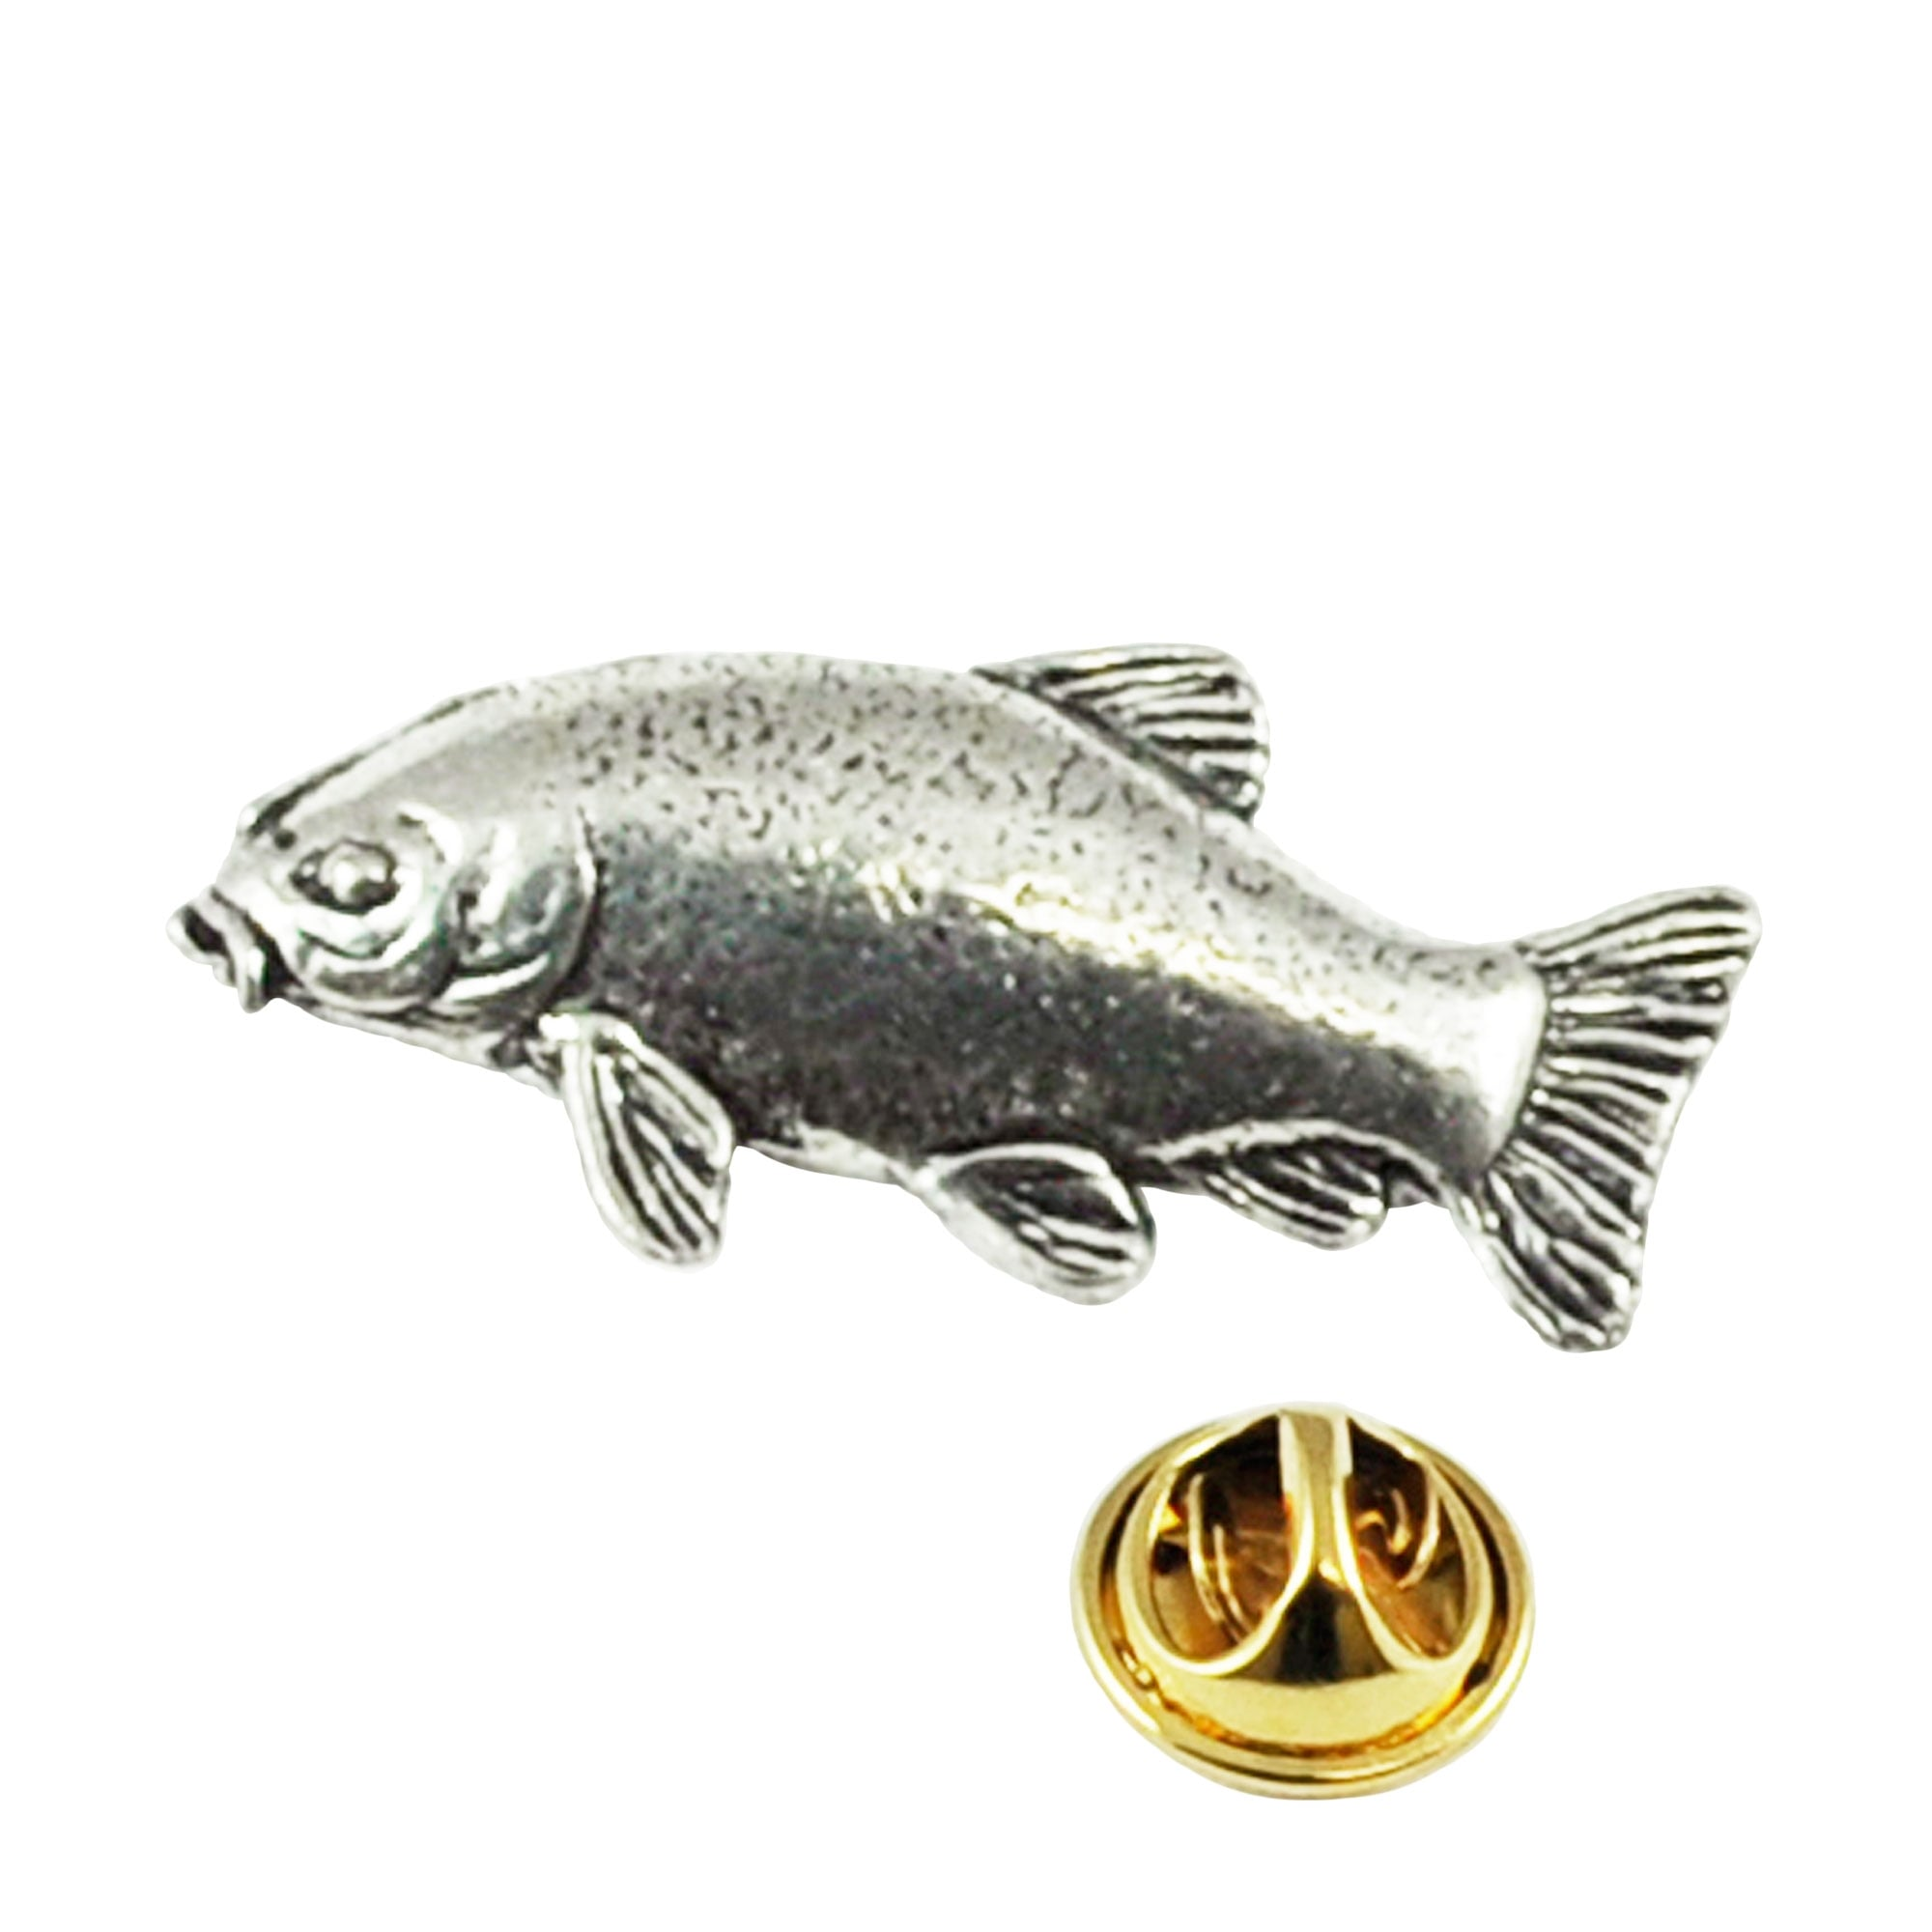 Lapel Pin Badge Fishing Pin Badge Tie Pin Leaping Salmon Fish